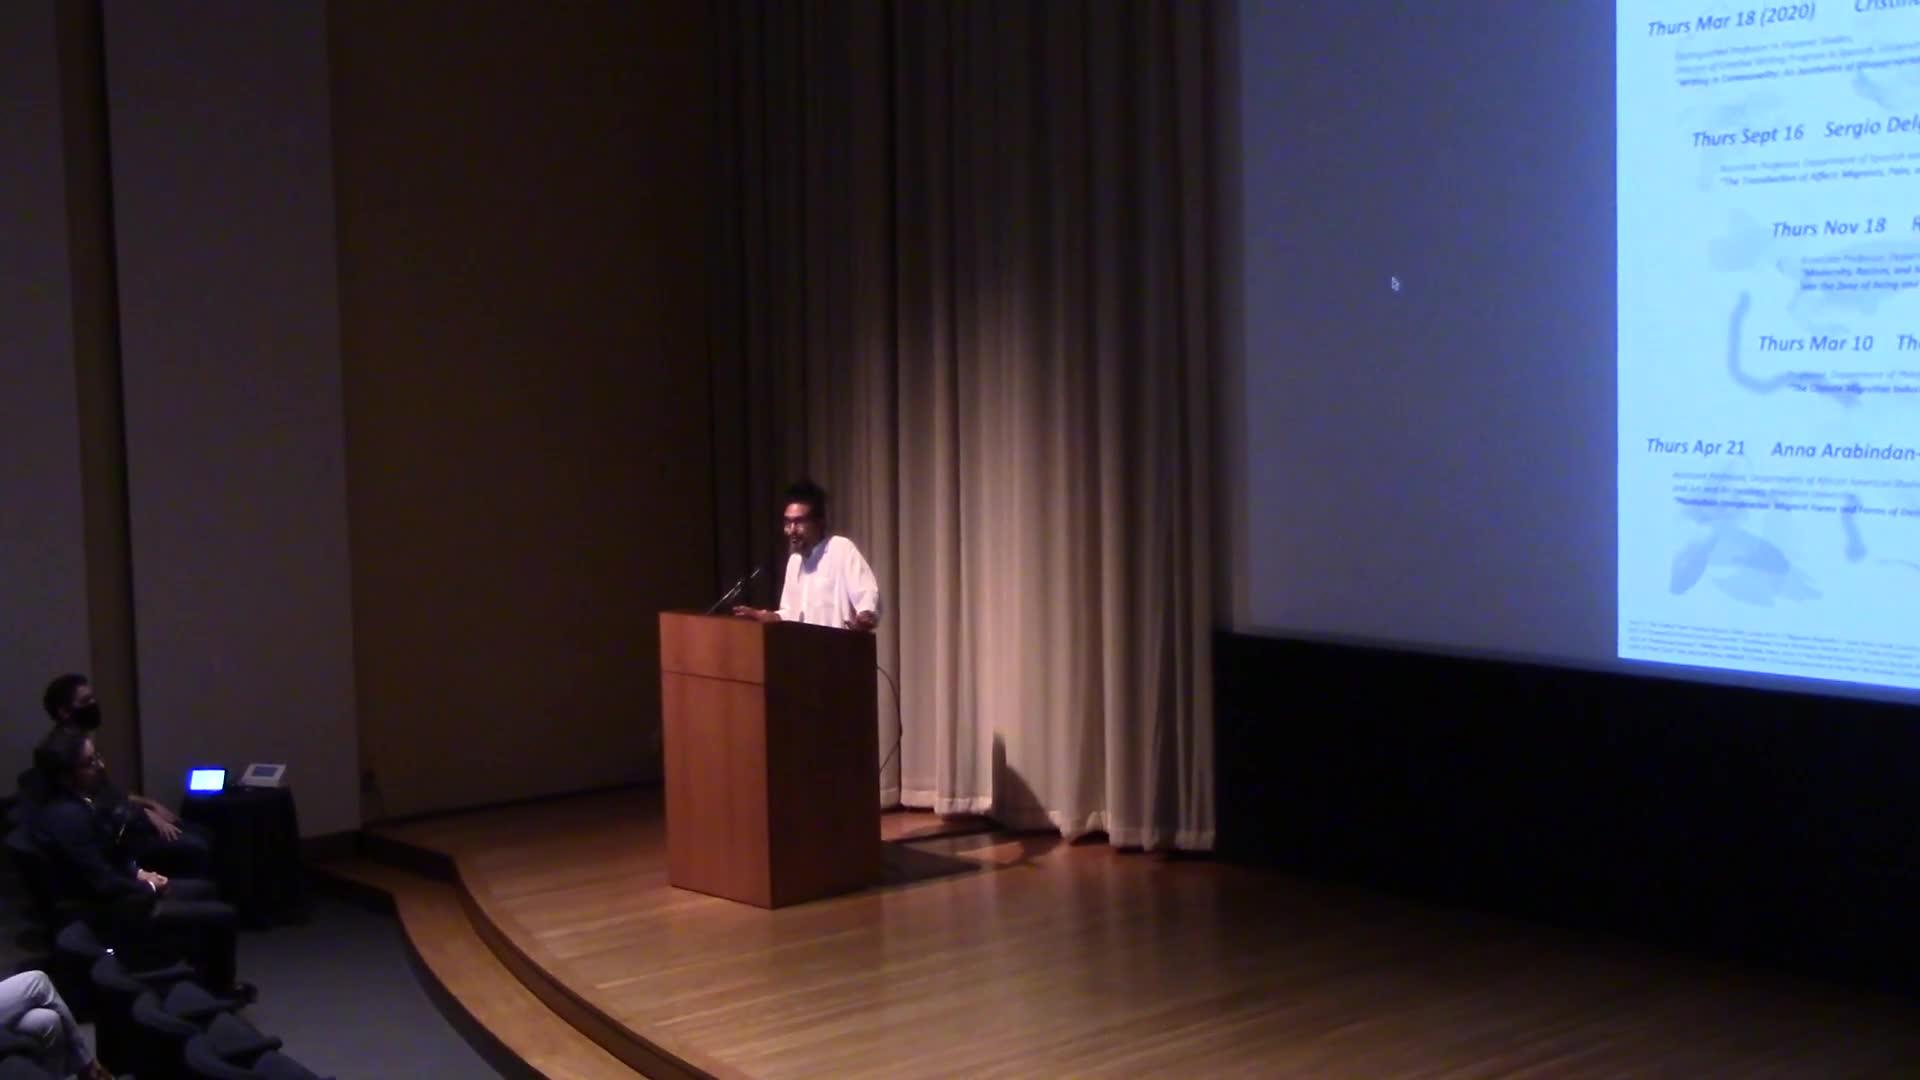 Humanities on the Edge presents: Sergio Delgado Moya